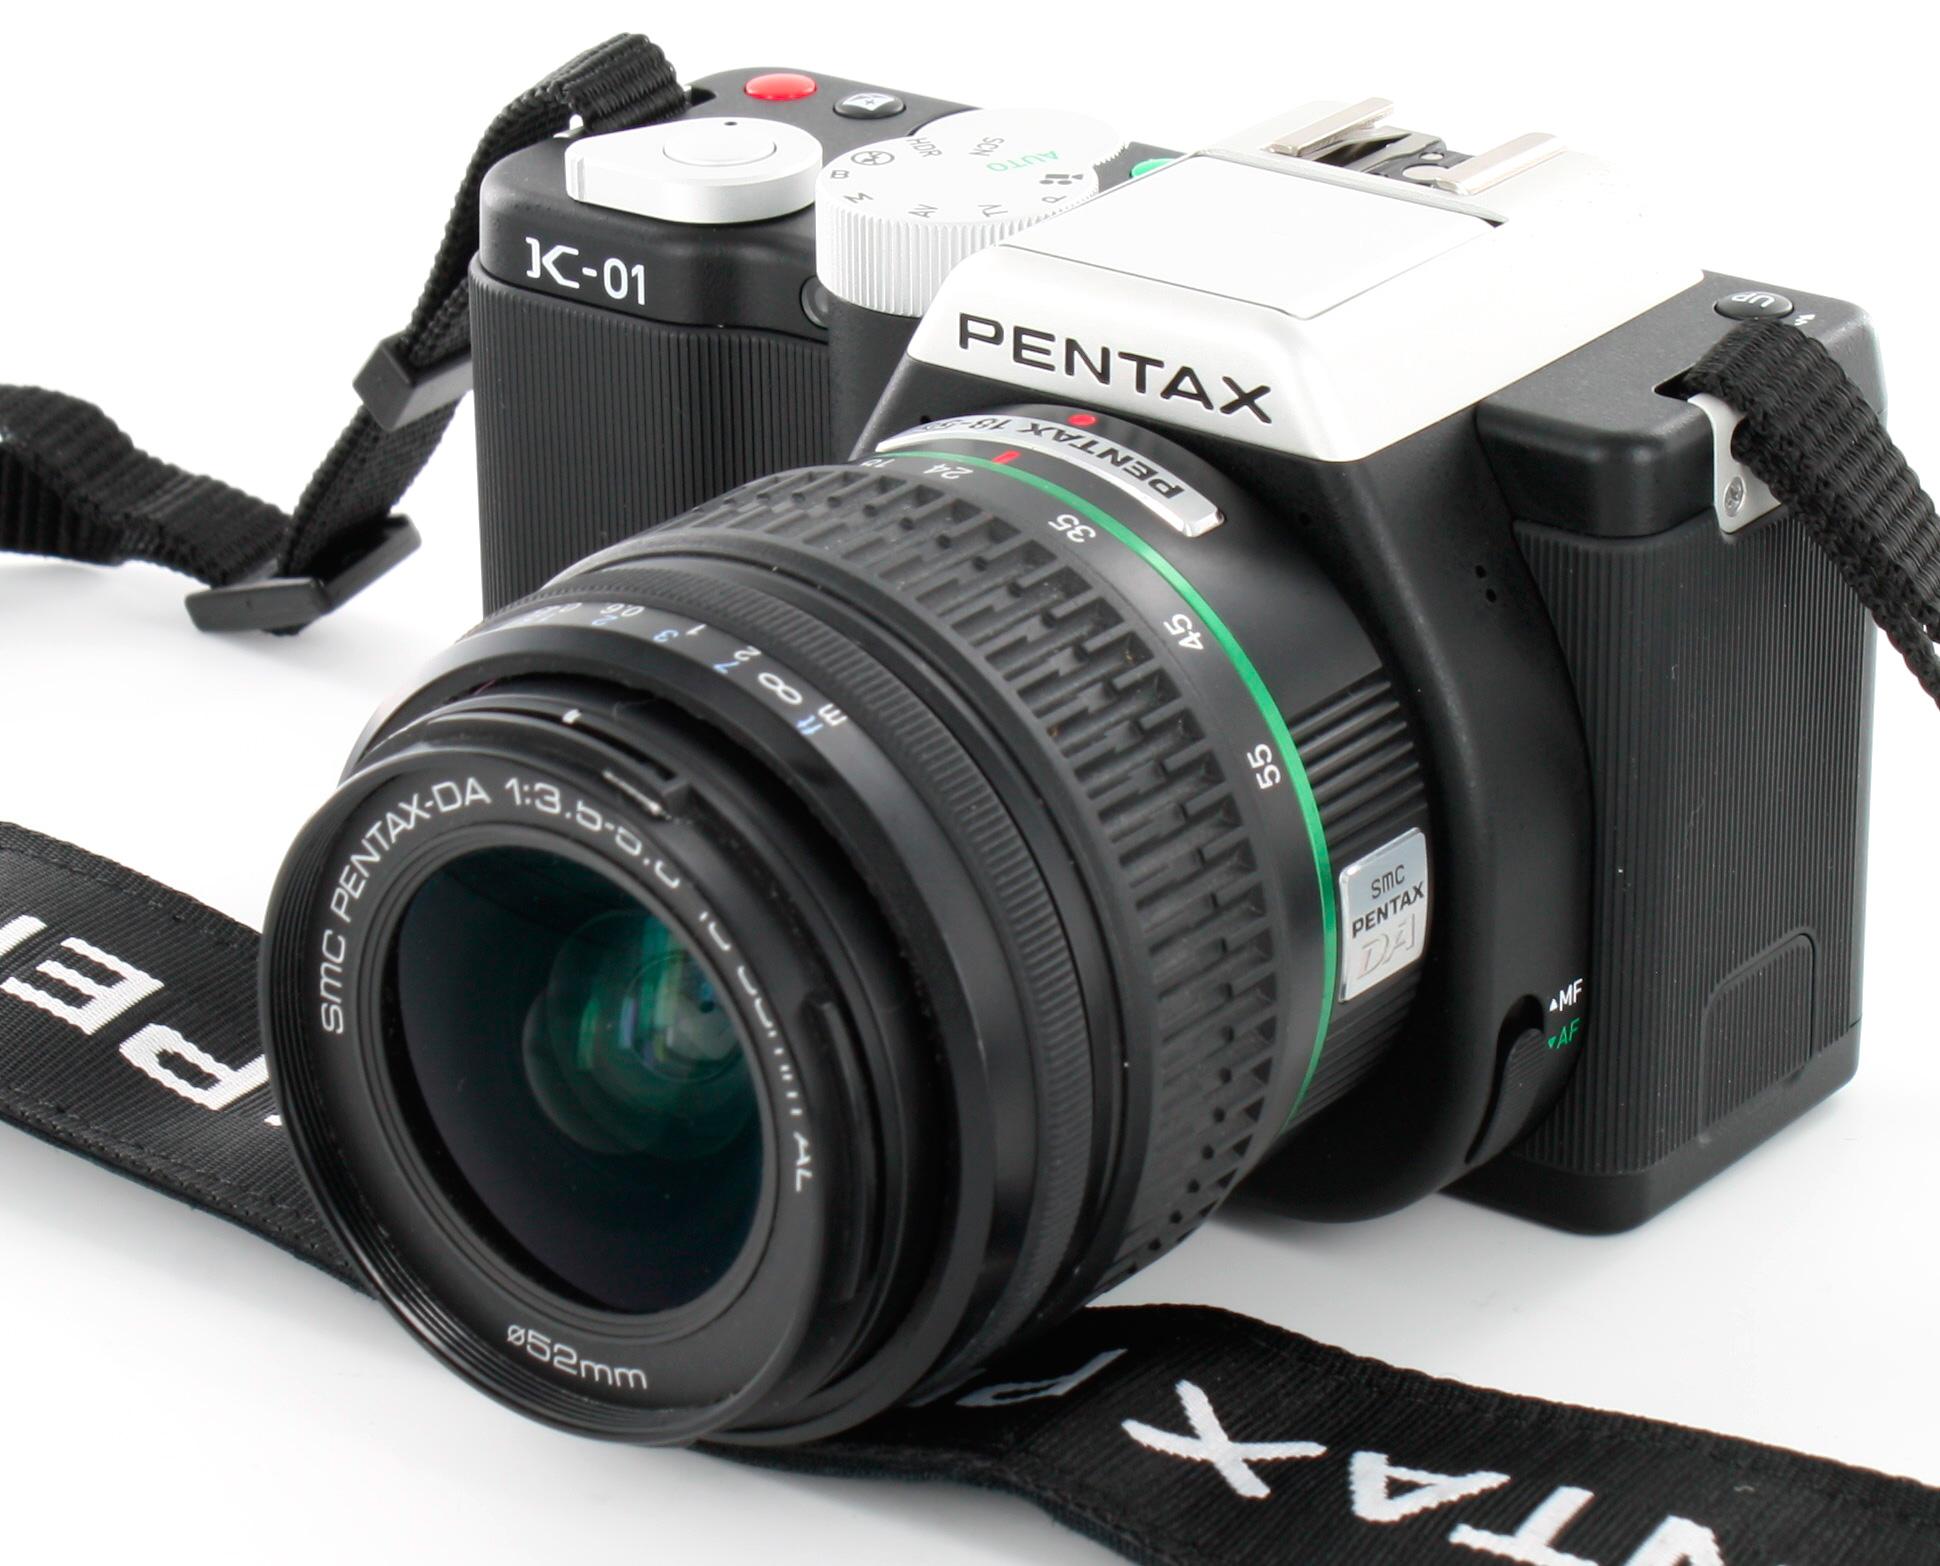 Pentax K-01 vs Pentax Digital SLR